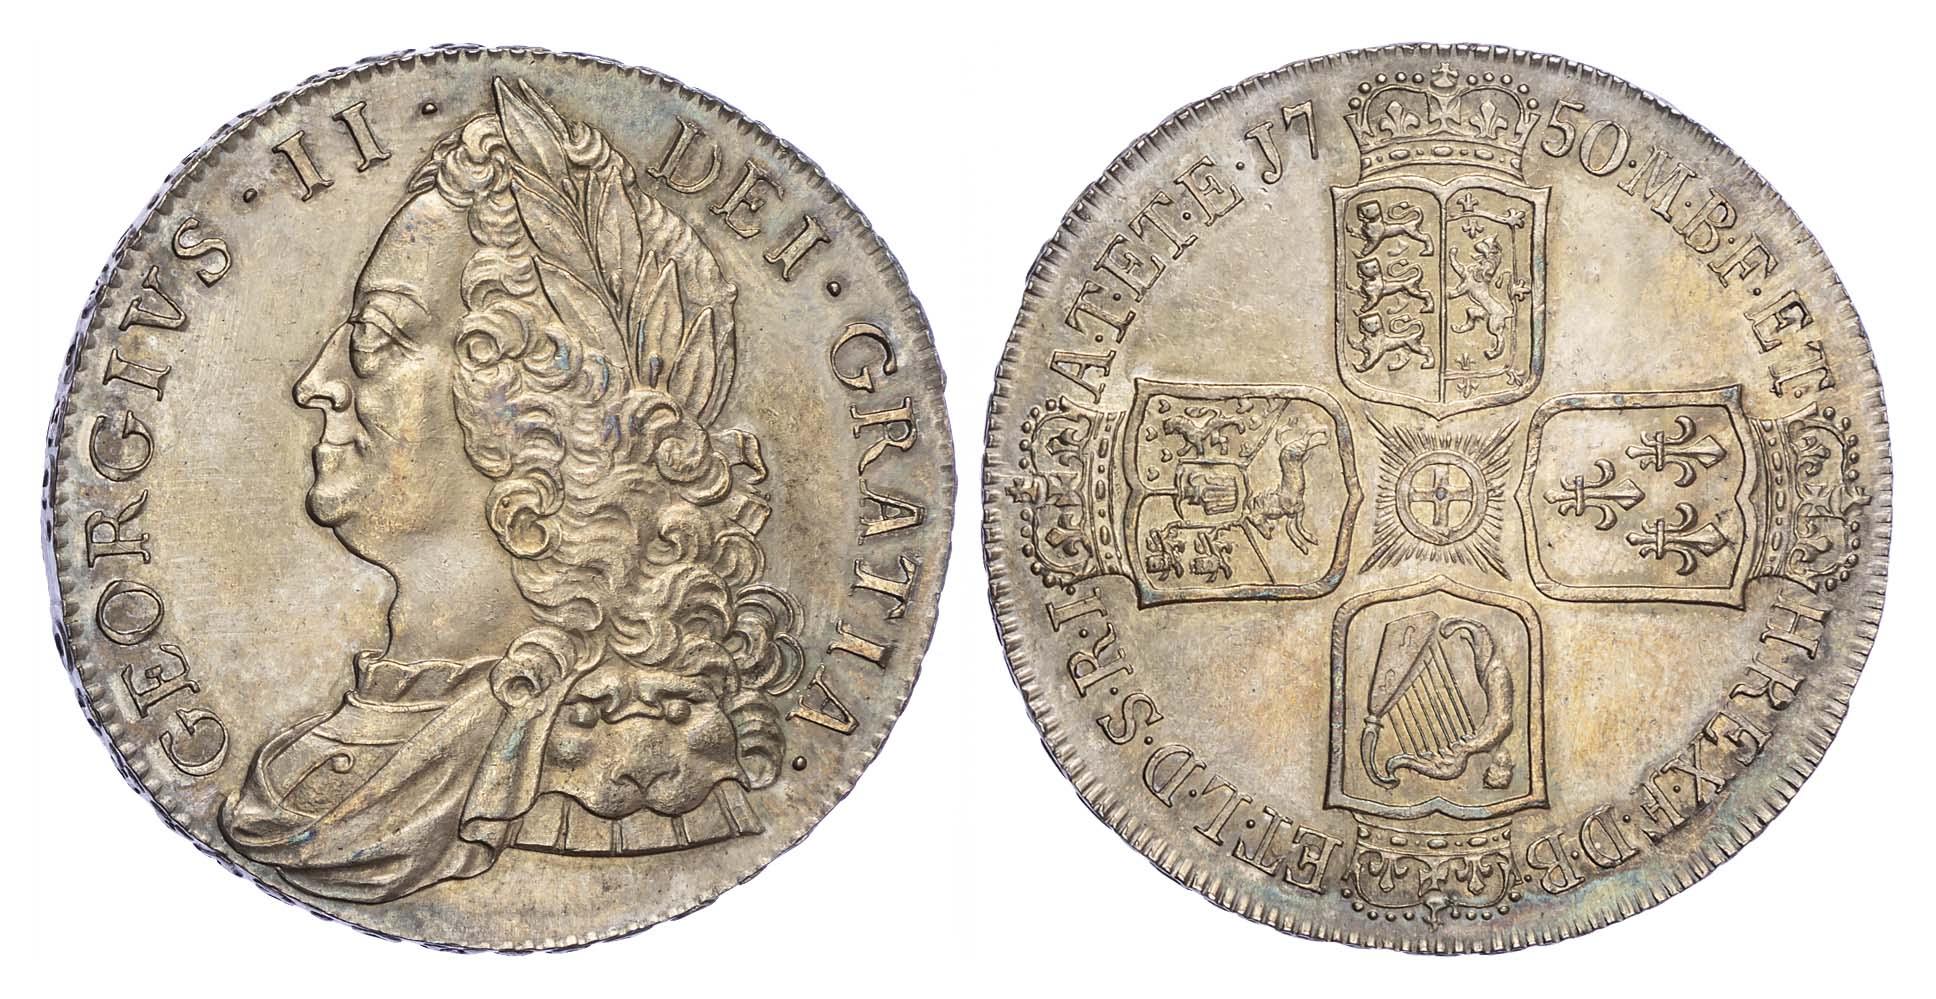 George II (1727-60), Crown, 1750, Older bust, VICESIMO QVARTO Edge